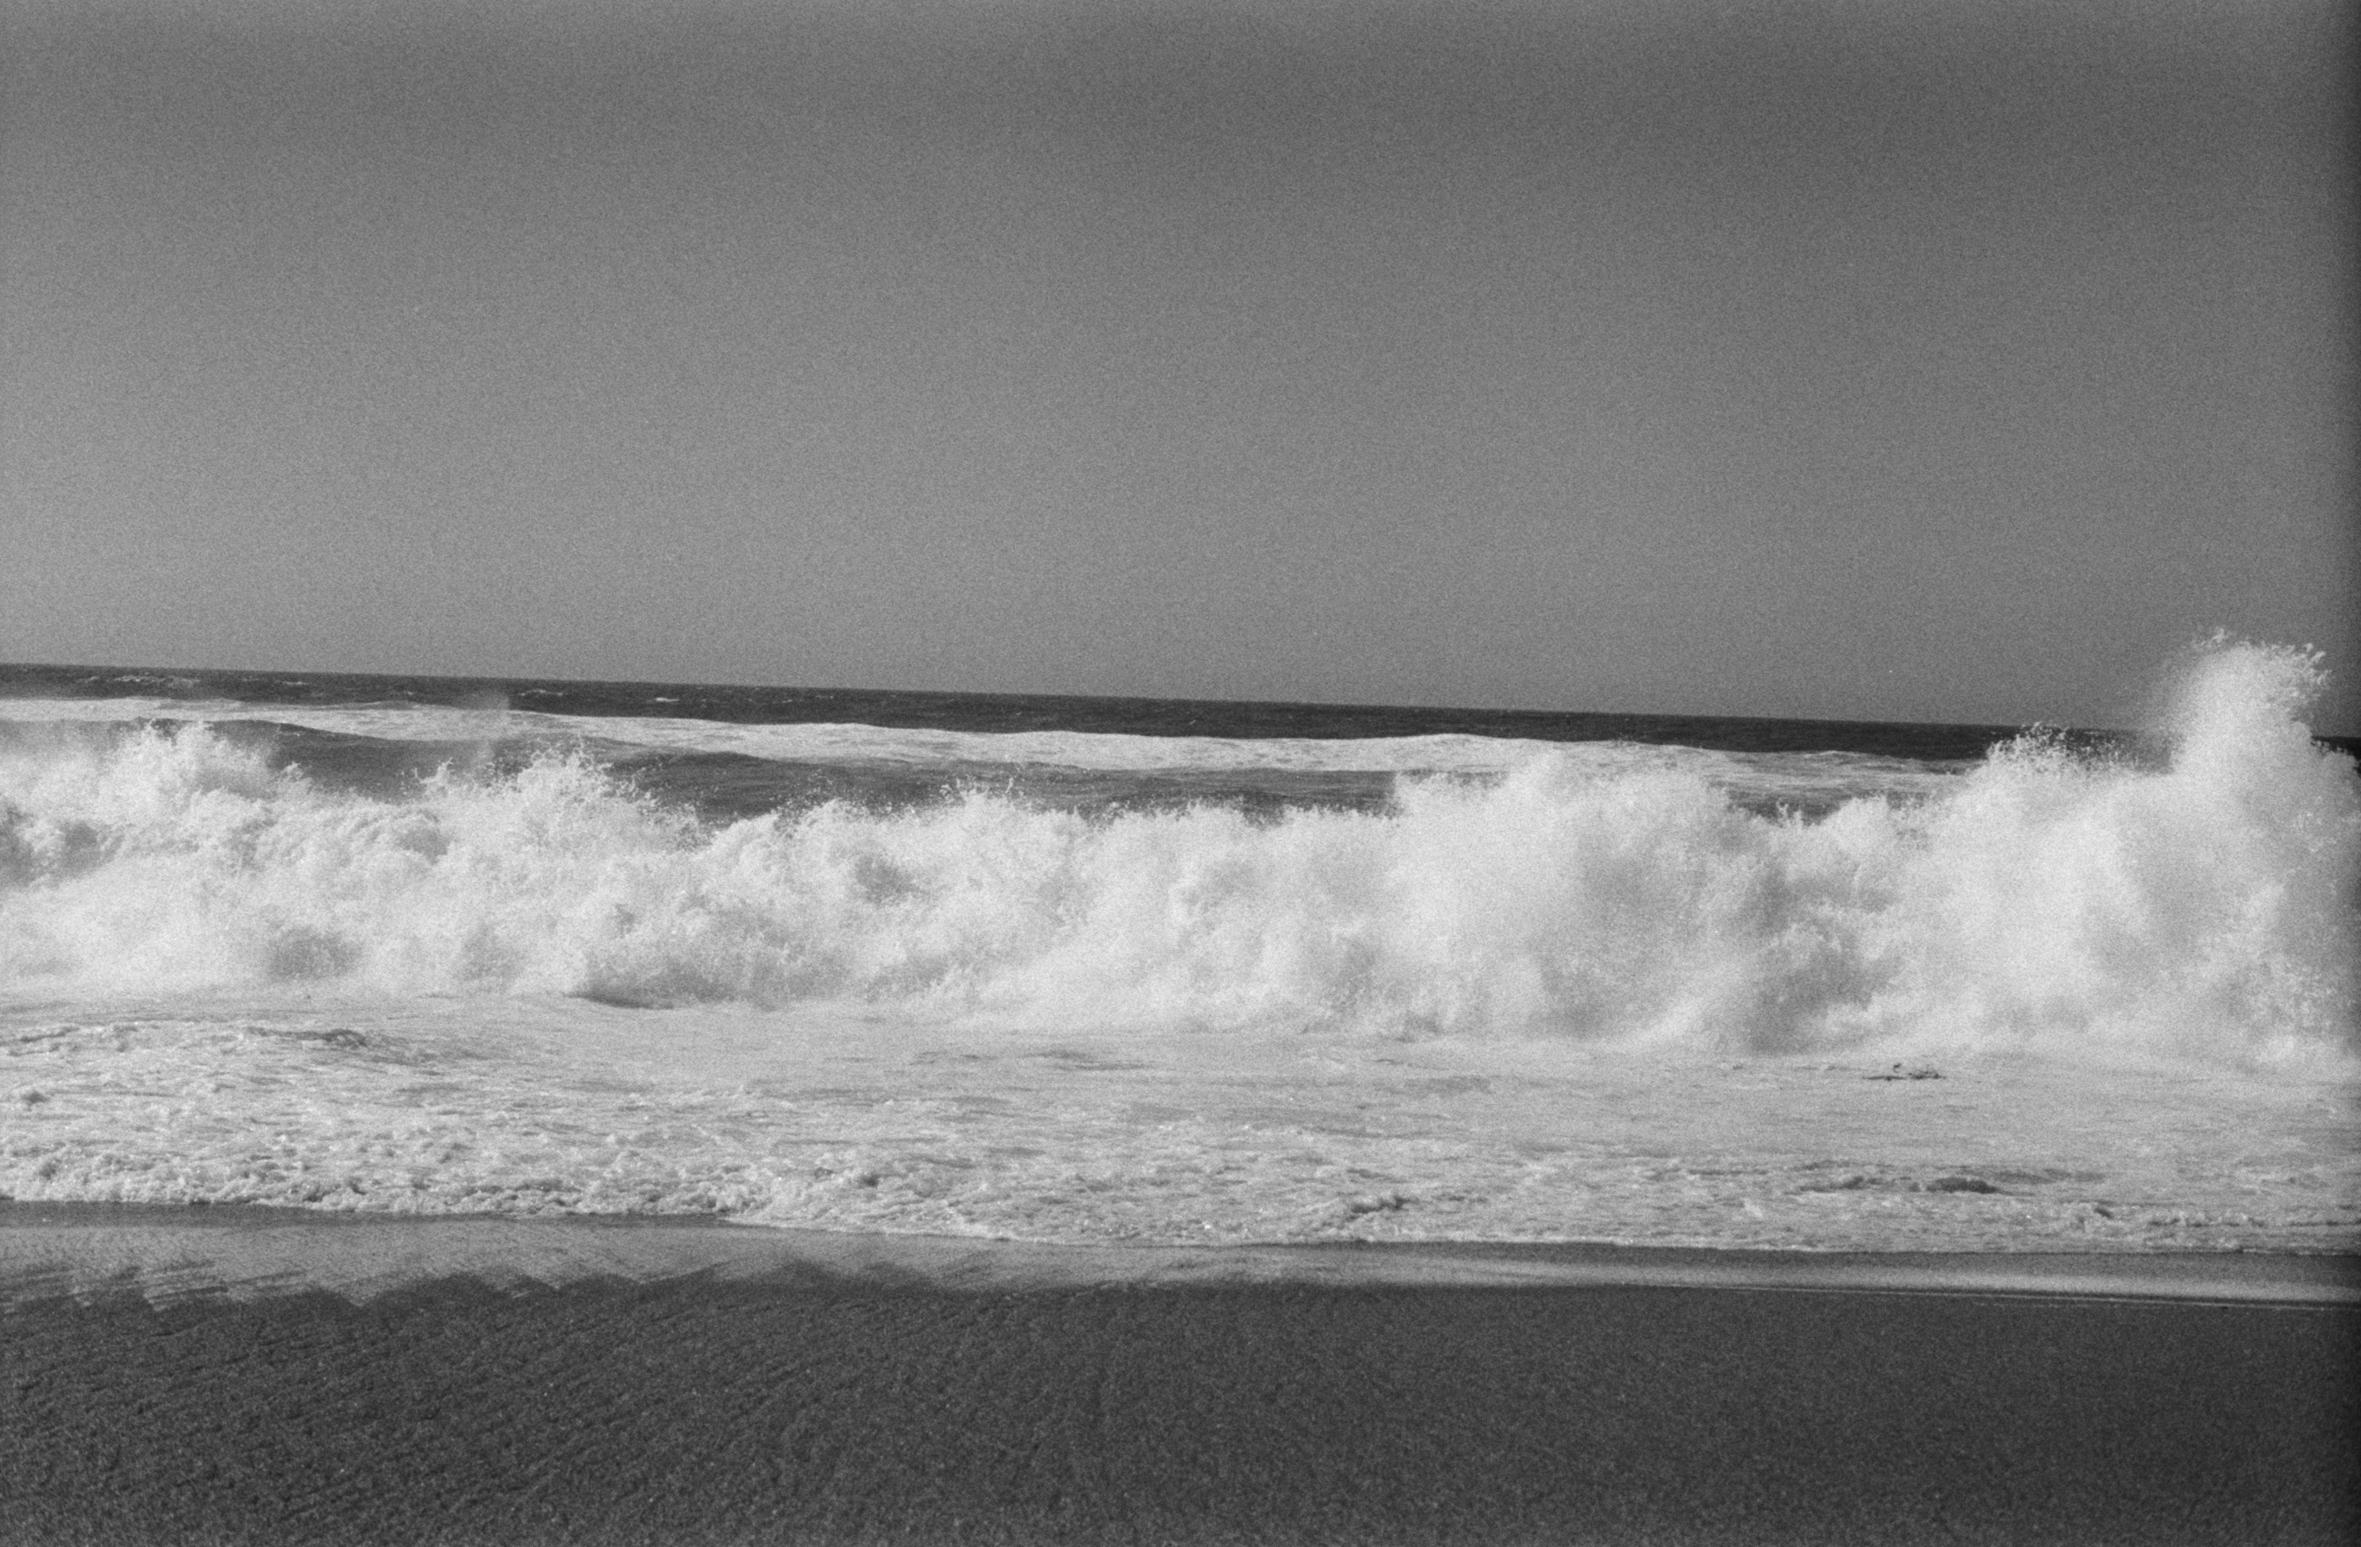 North Beach, Pt. Reyes National Seashore